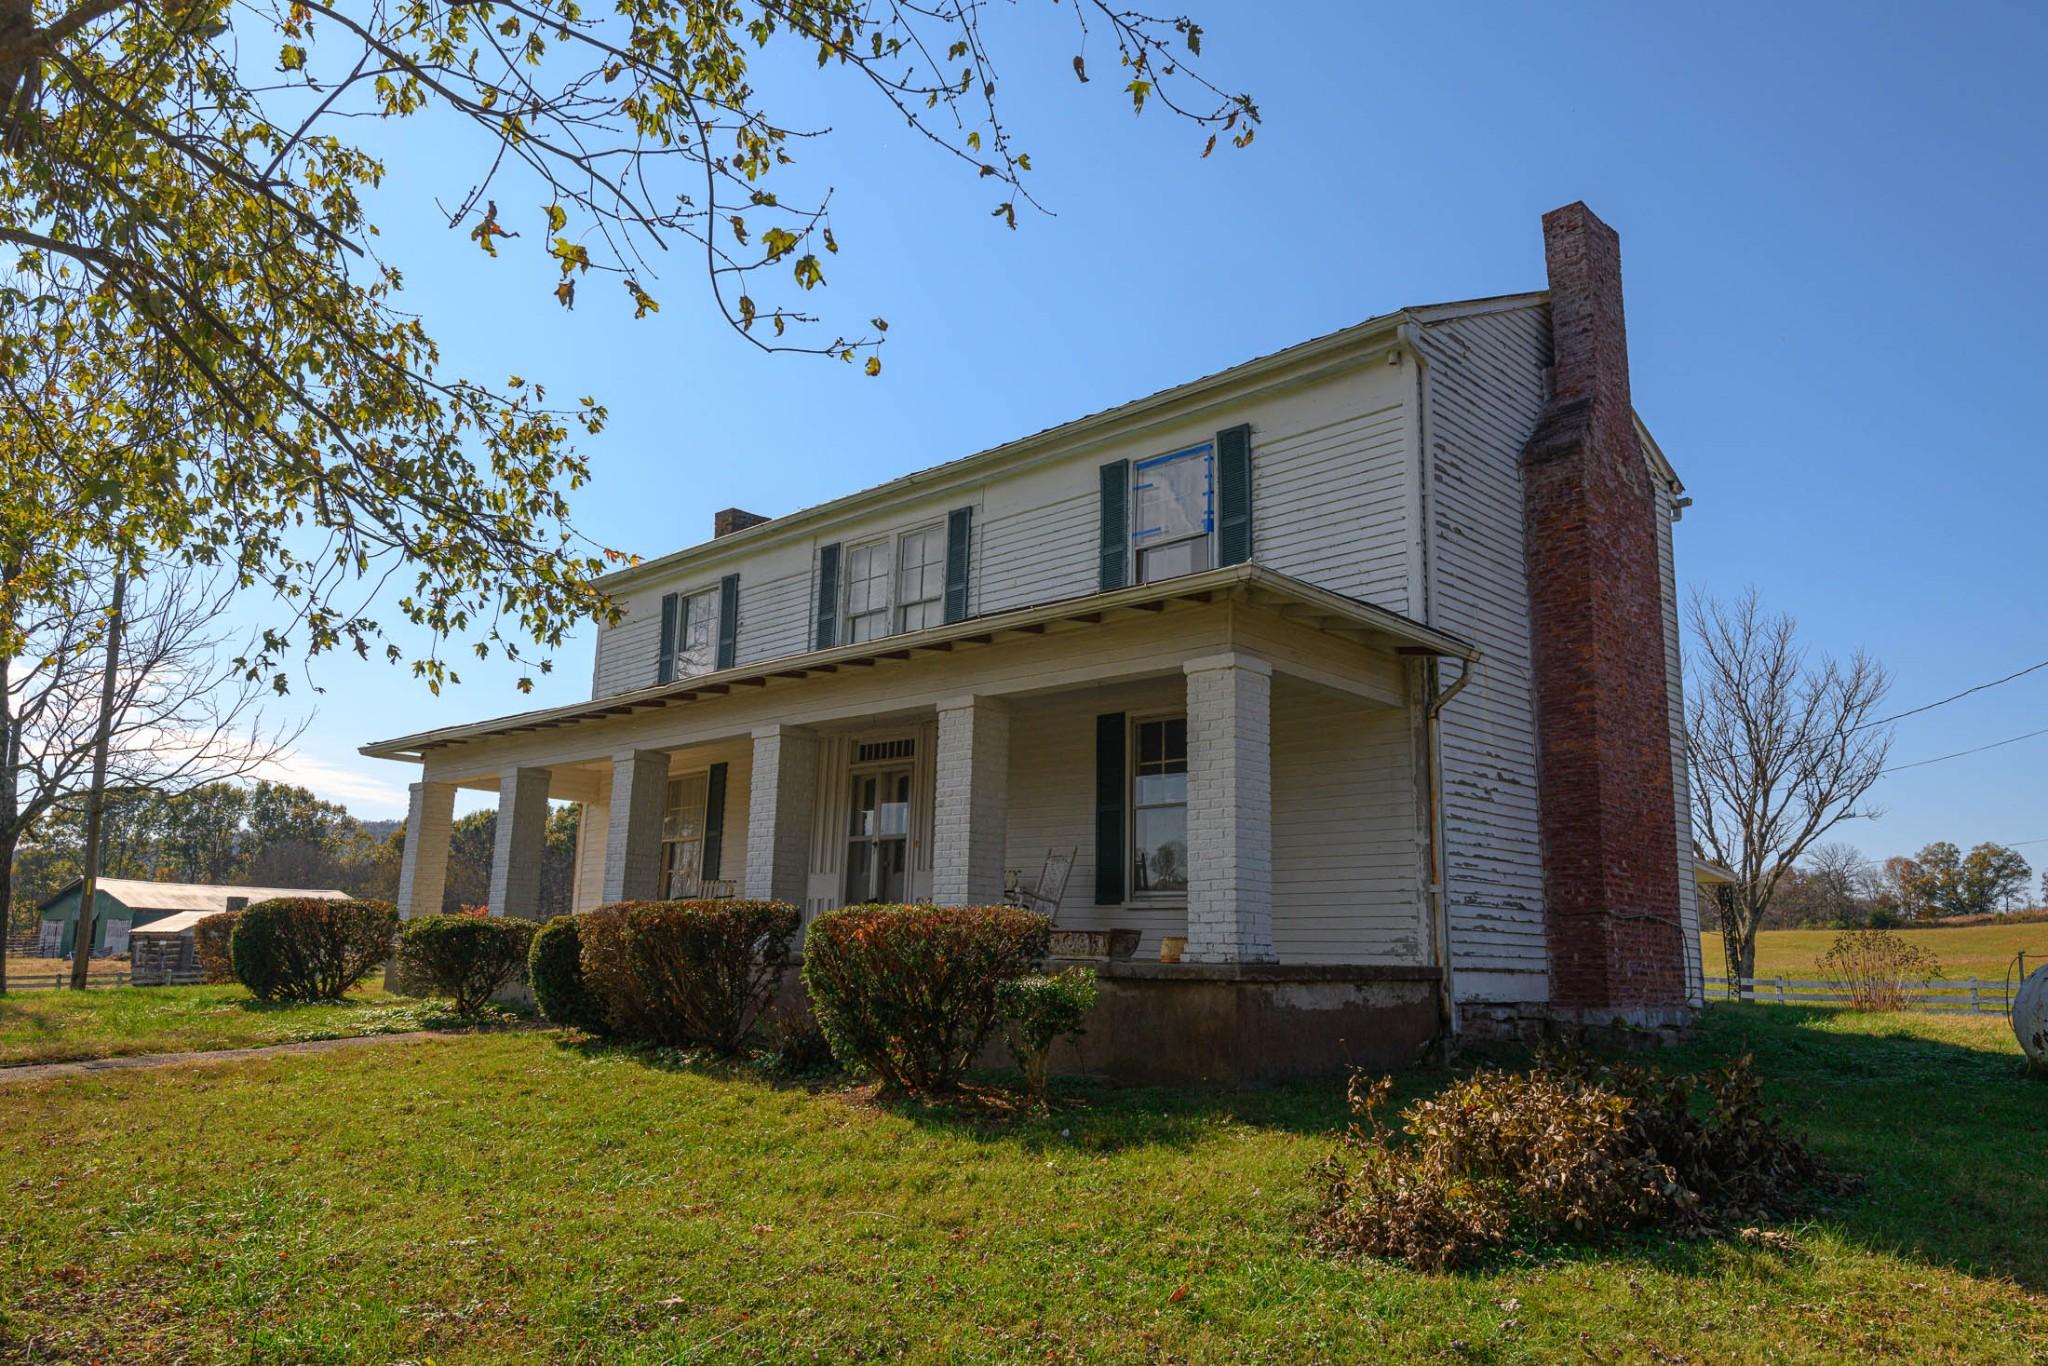 220 Alexandria Hwy, Brush Creek, TN 38547 - Brush Creek, TN real estate listing